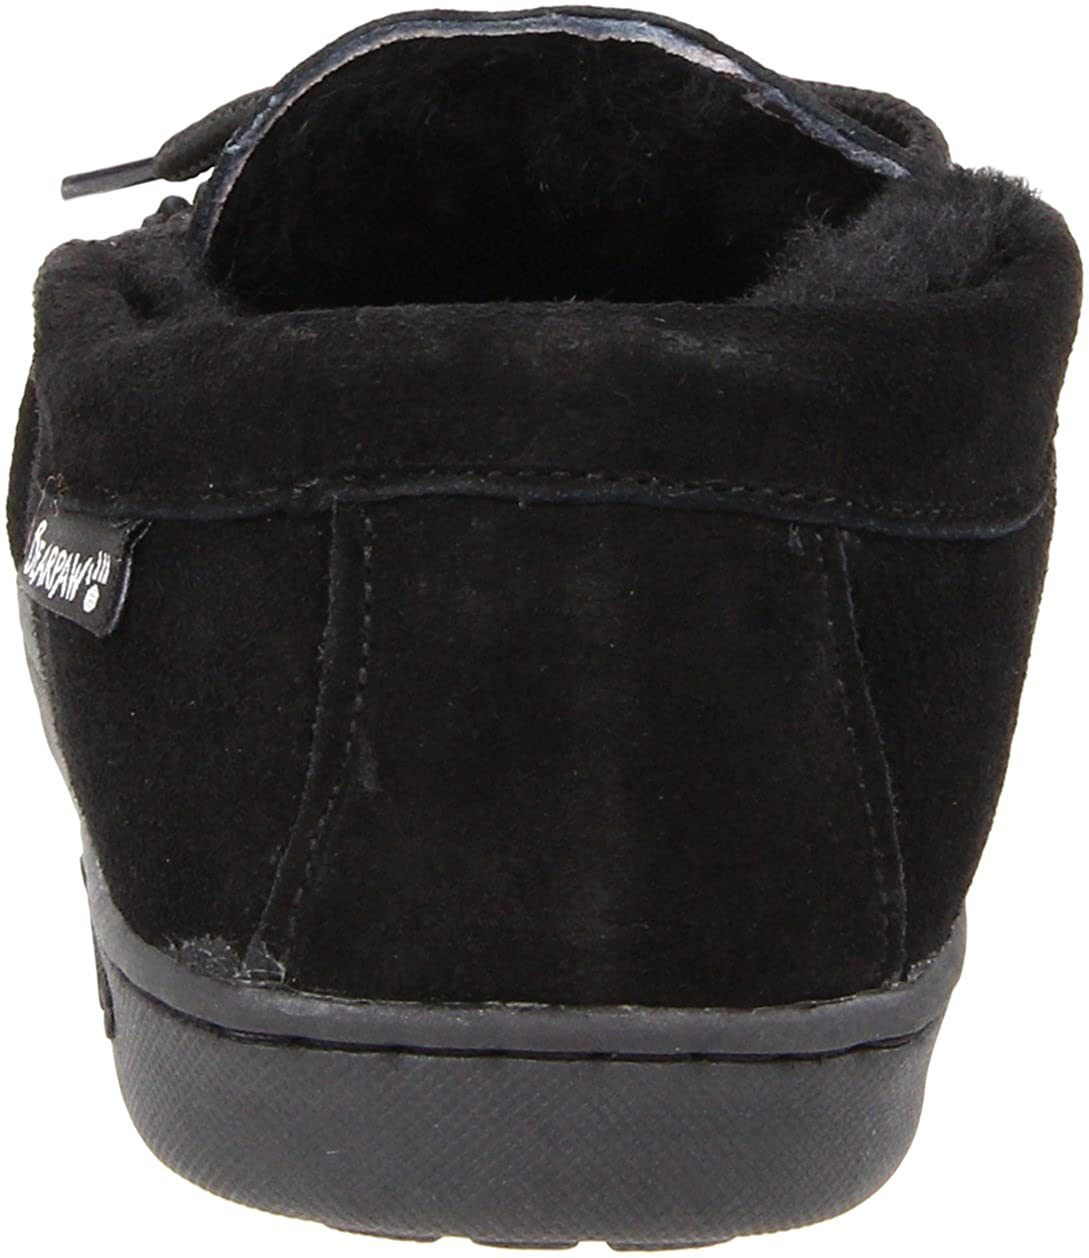 Bearpaw Mindy, Damen Halbschuhe/Slipper Halbschuhe/Slipper Halbschuhe/Slipper Black 119798